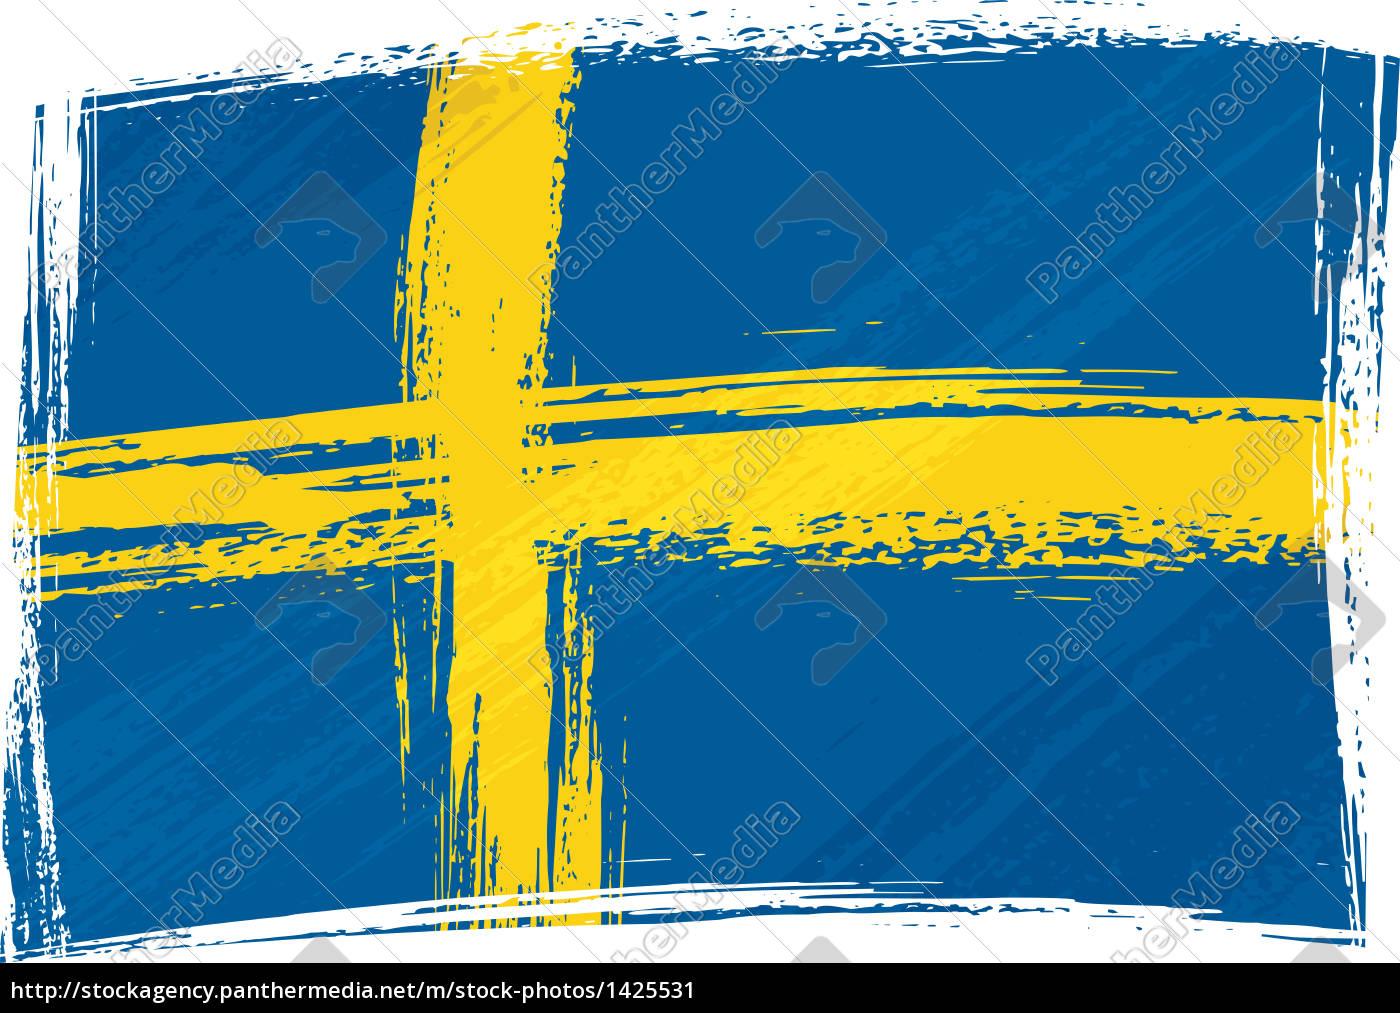 grunge schweden flagge stockfoto 1425531 bildagentur panthermedia. Black Bedroom Furniture Sets. Home Design Ideas